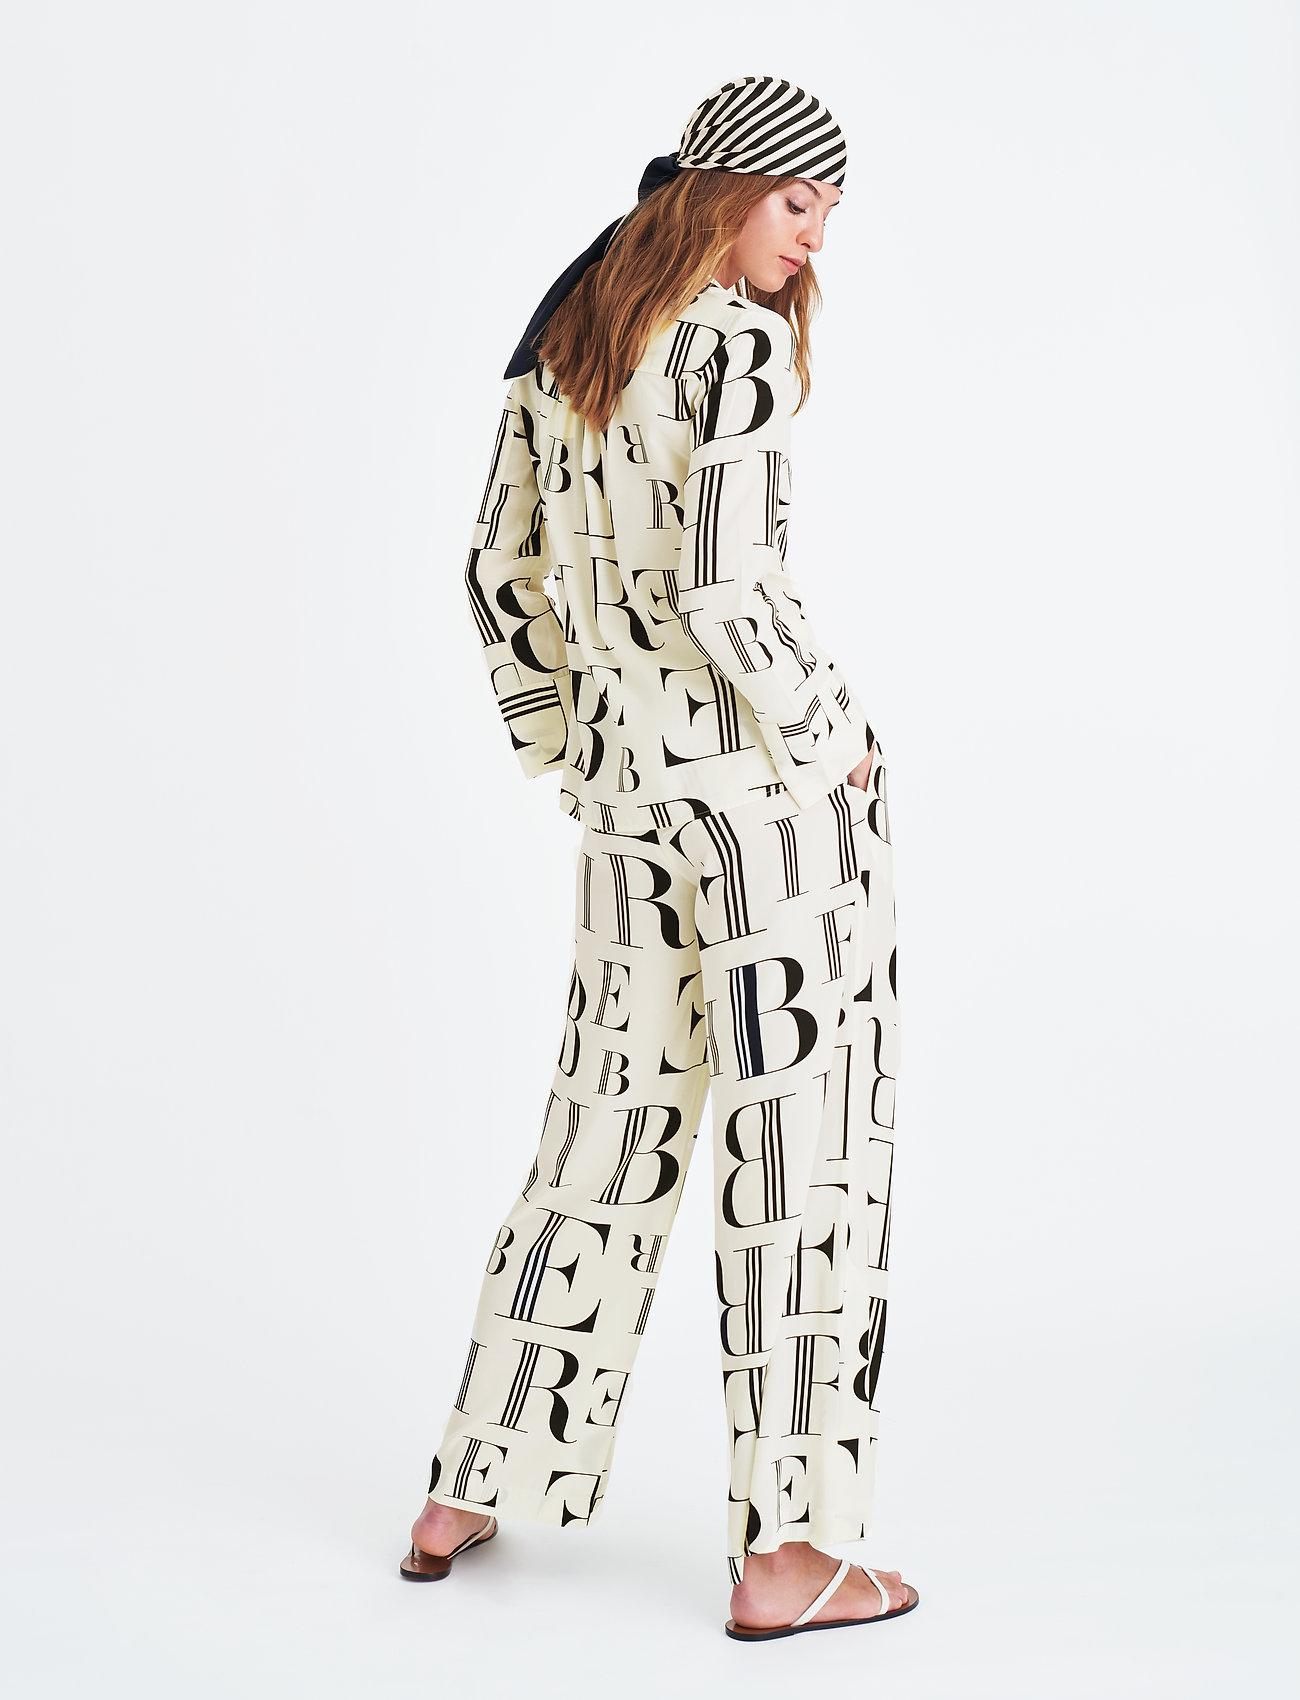 London Shirt (Black) (851.95 kr) - Elle Style Awards Collection 2019